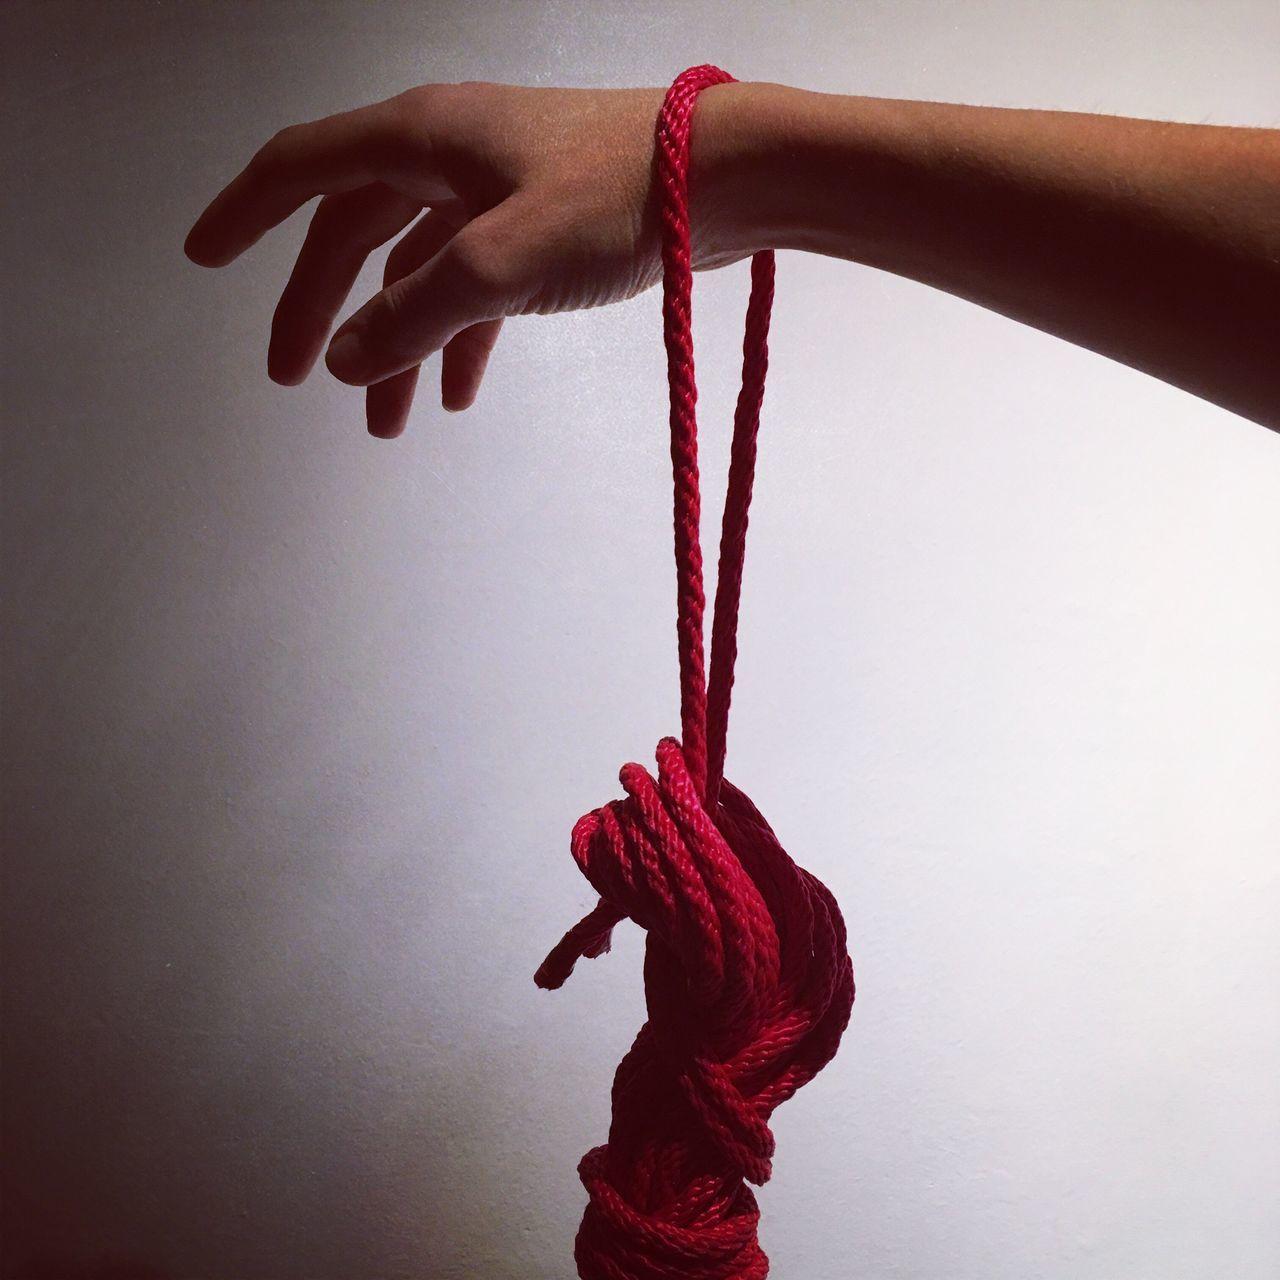 Cuerdas Hand Red Shape Photoart Photography